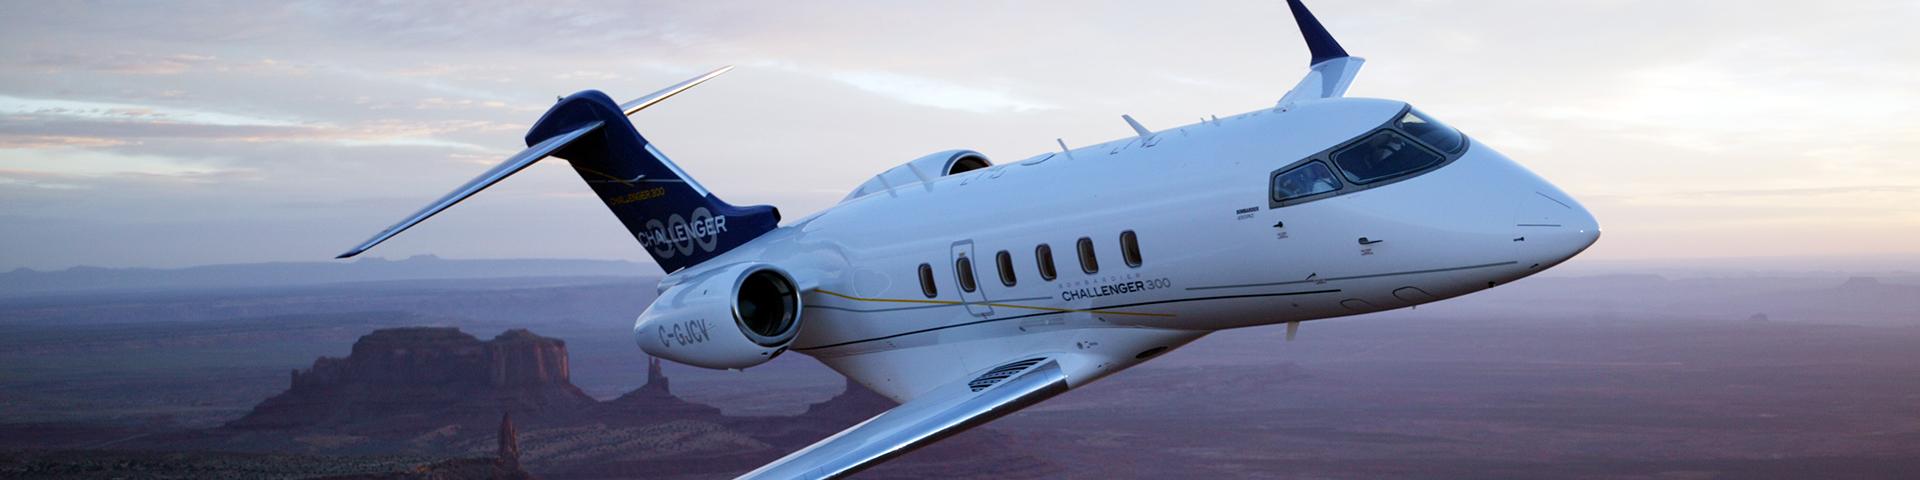 Challenger 300 Private Jet1 - Challenger 300 Private Jet